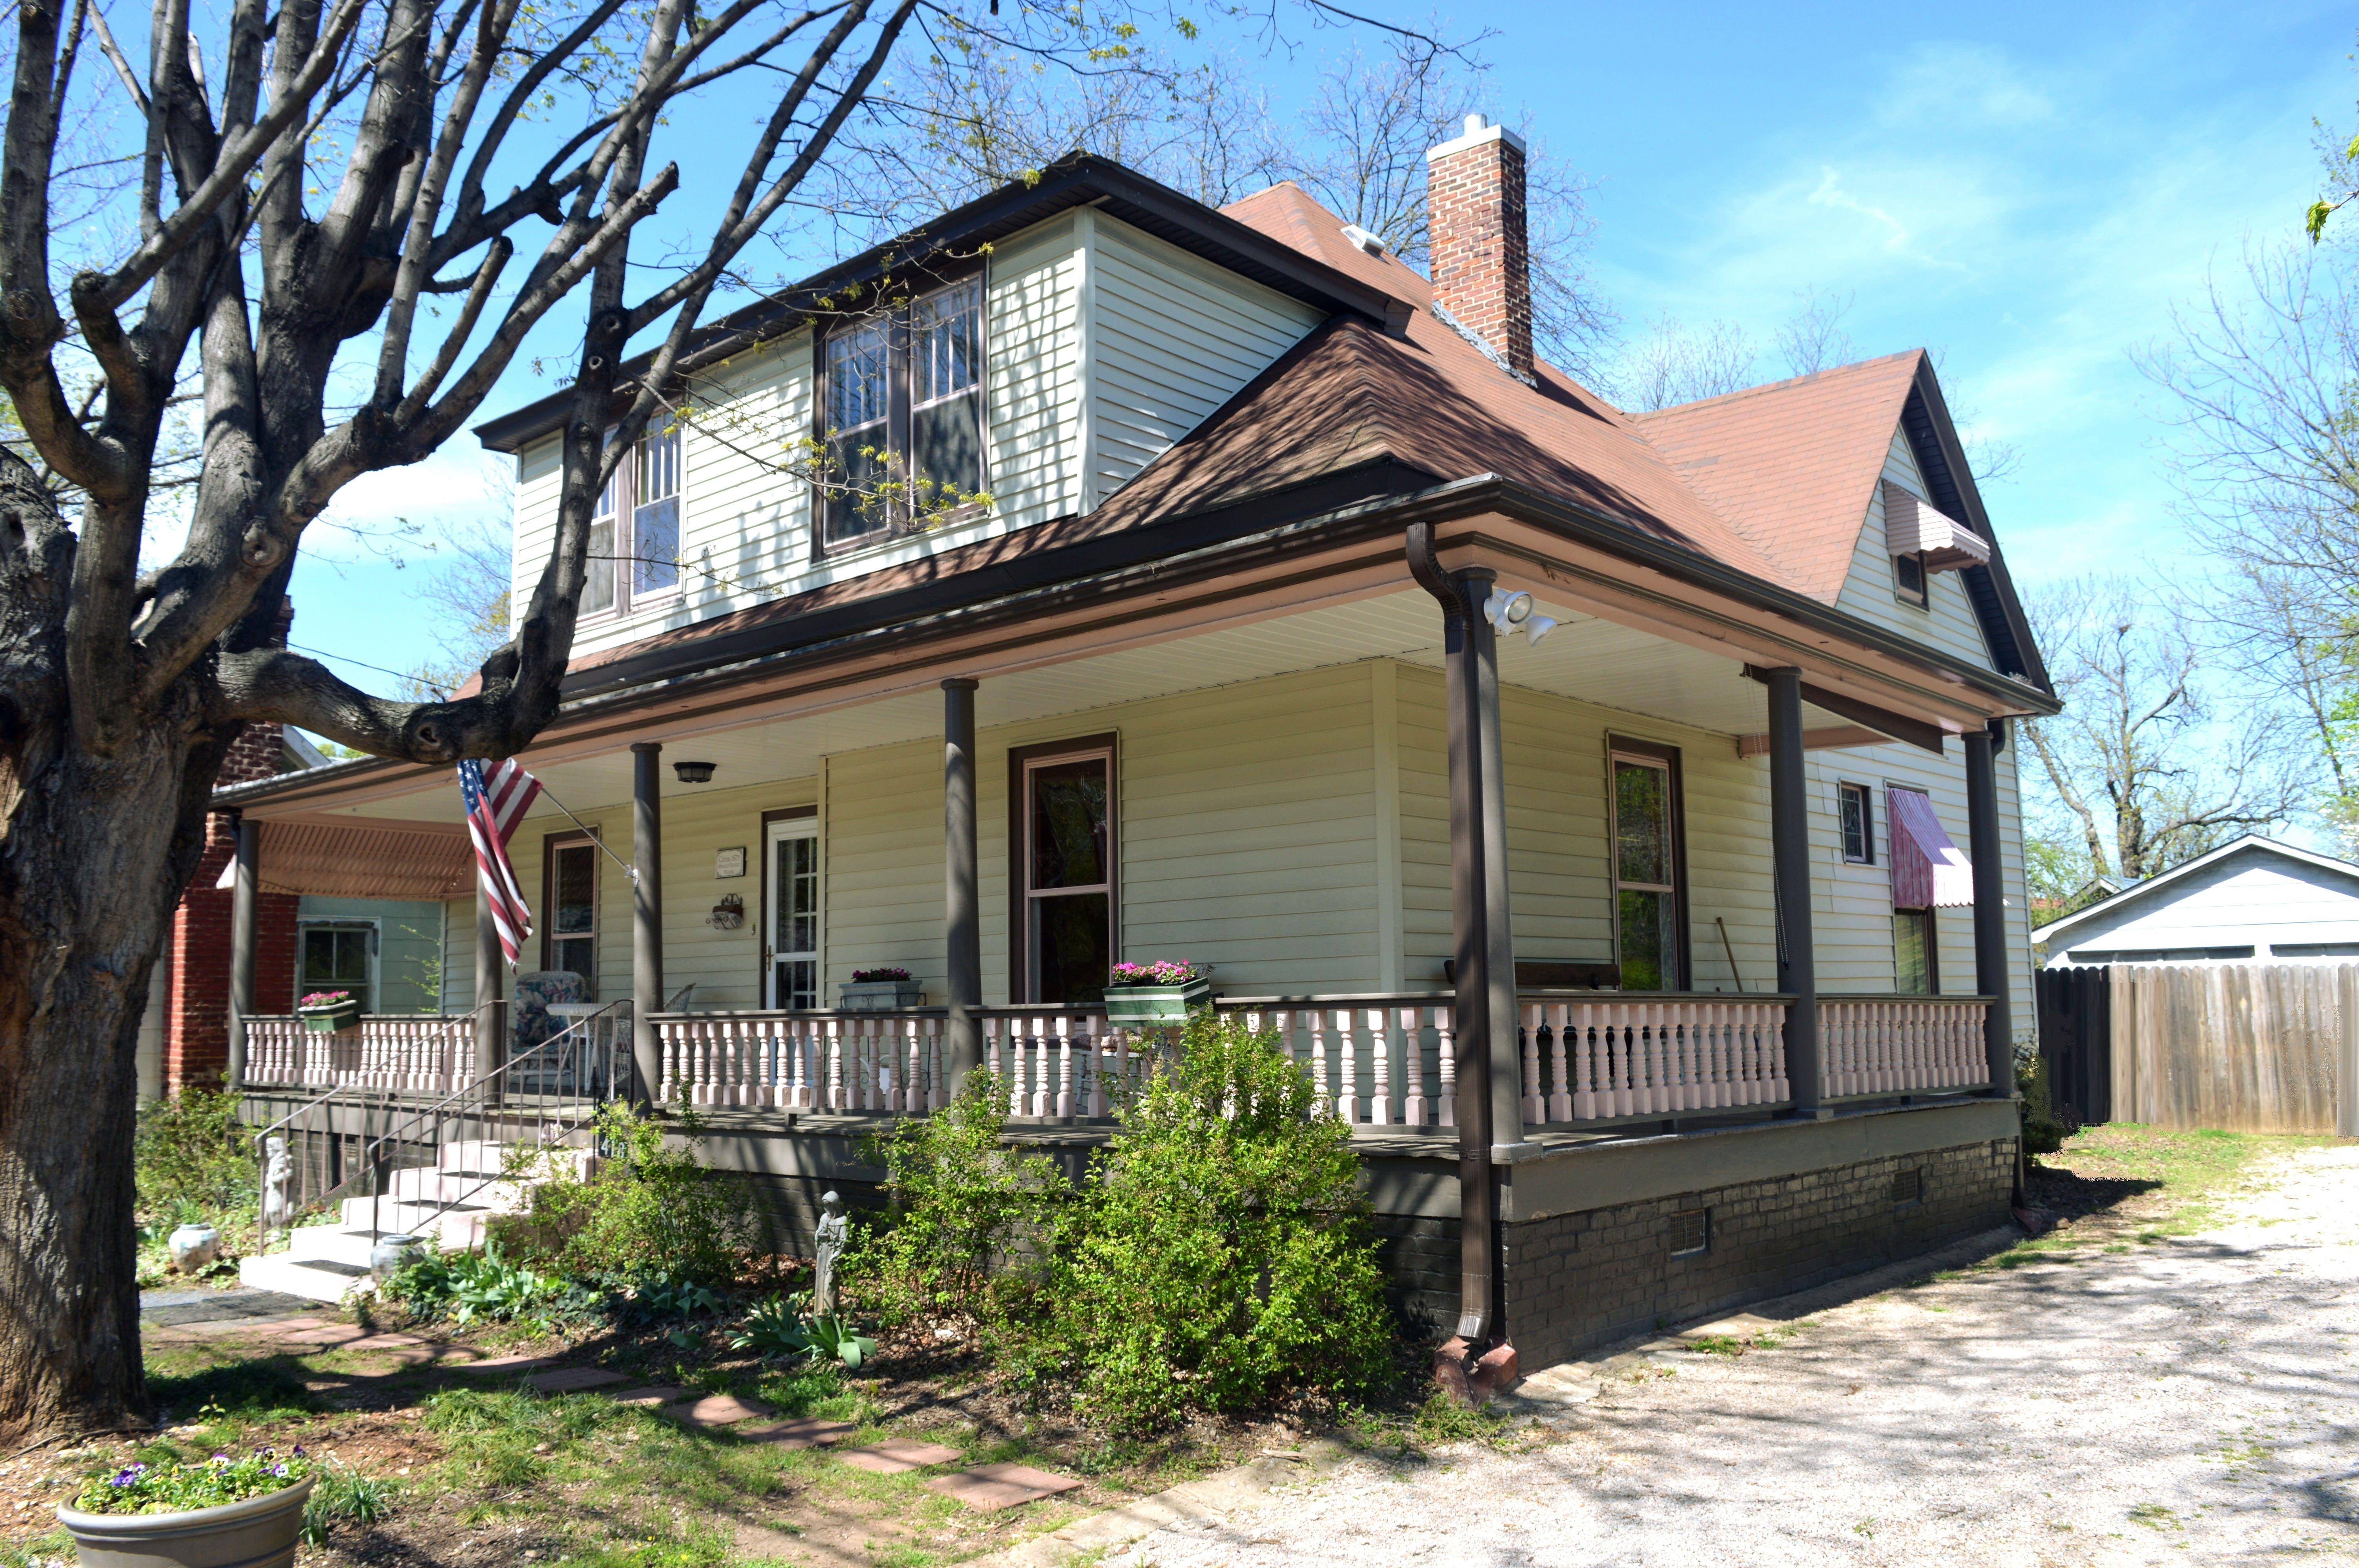 Circa 1875 shavertrexler house great wraparound front